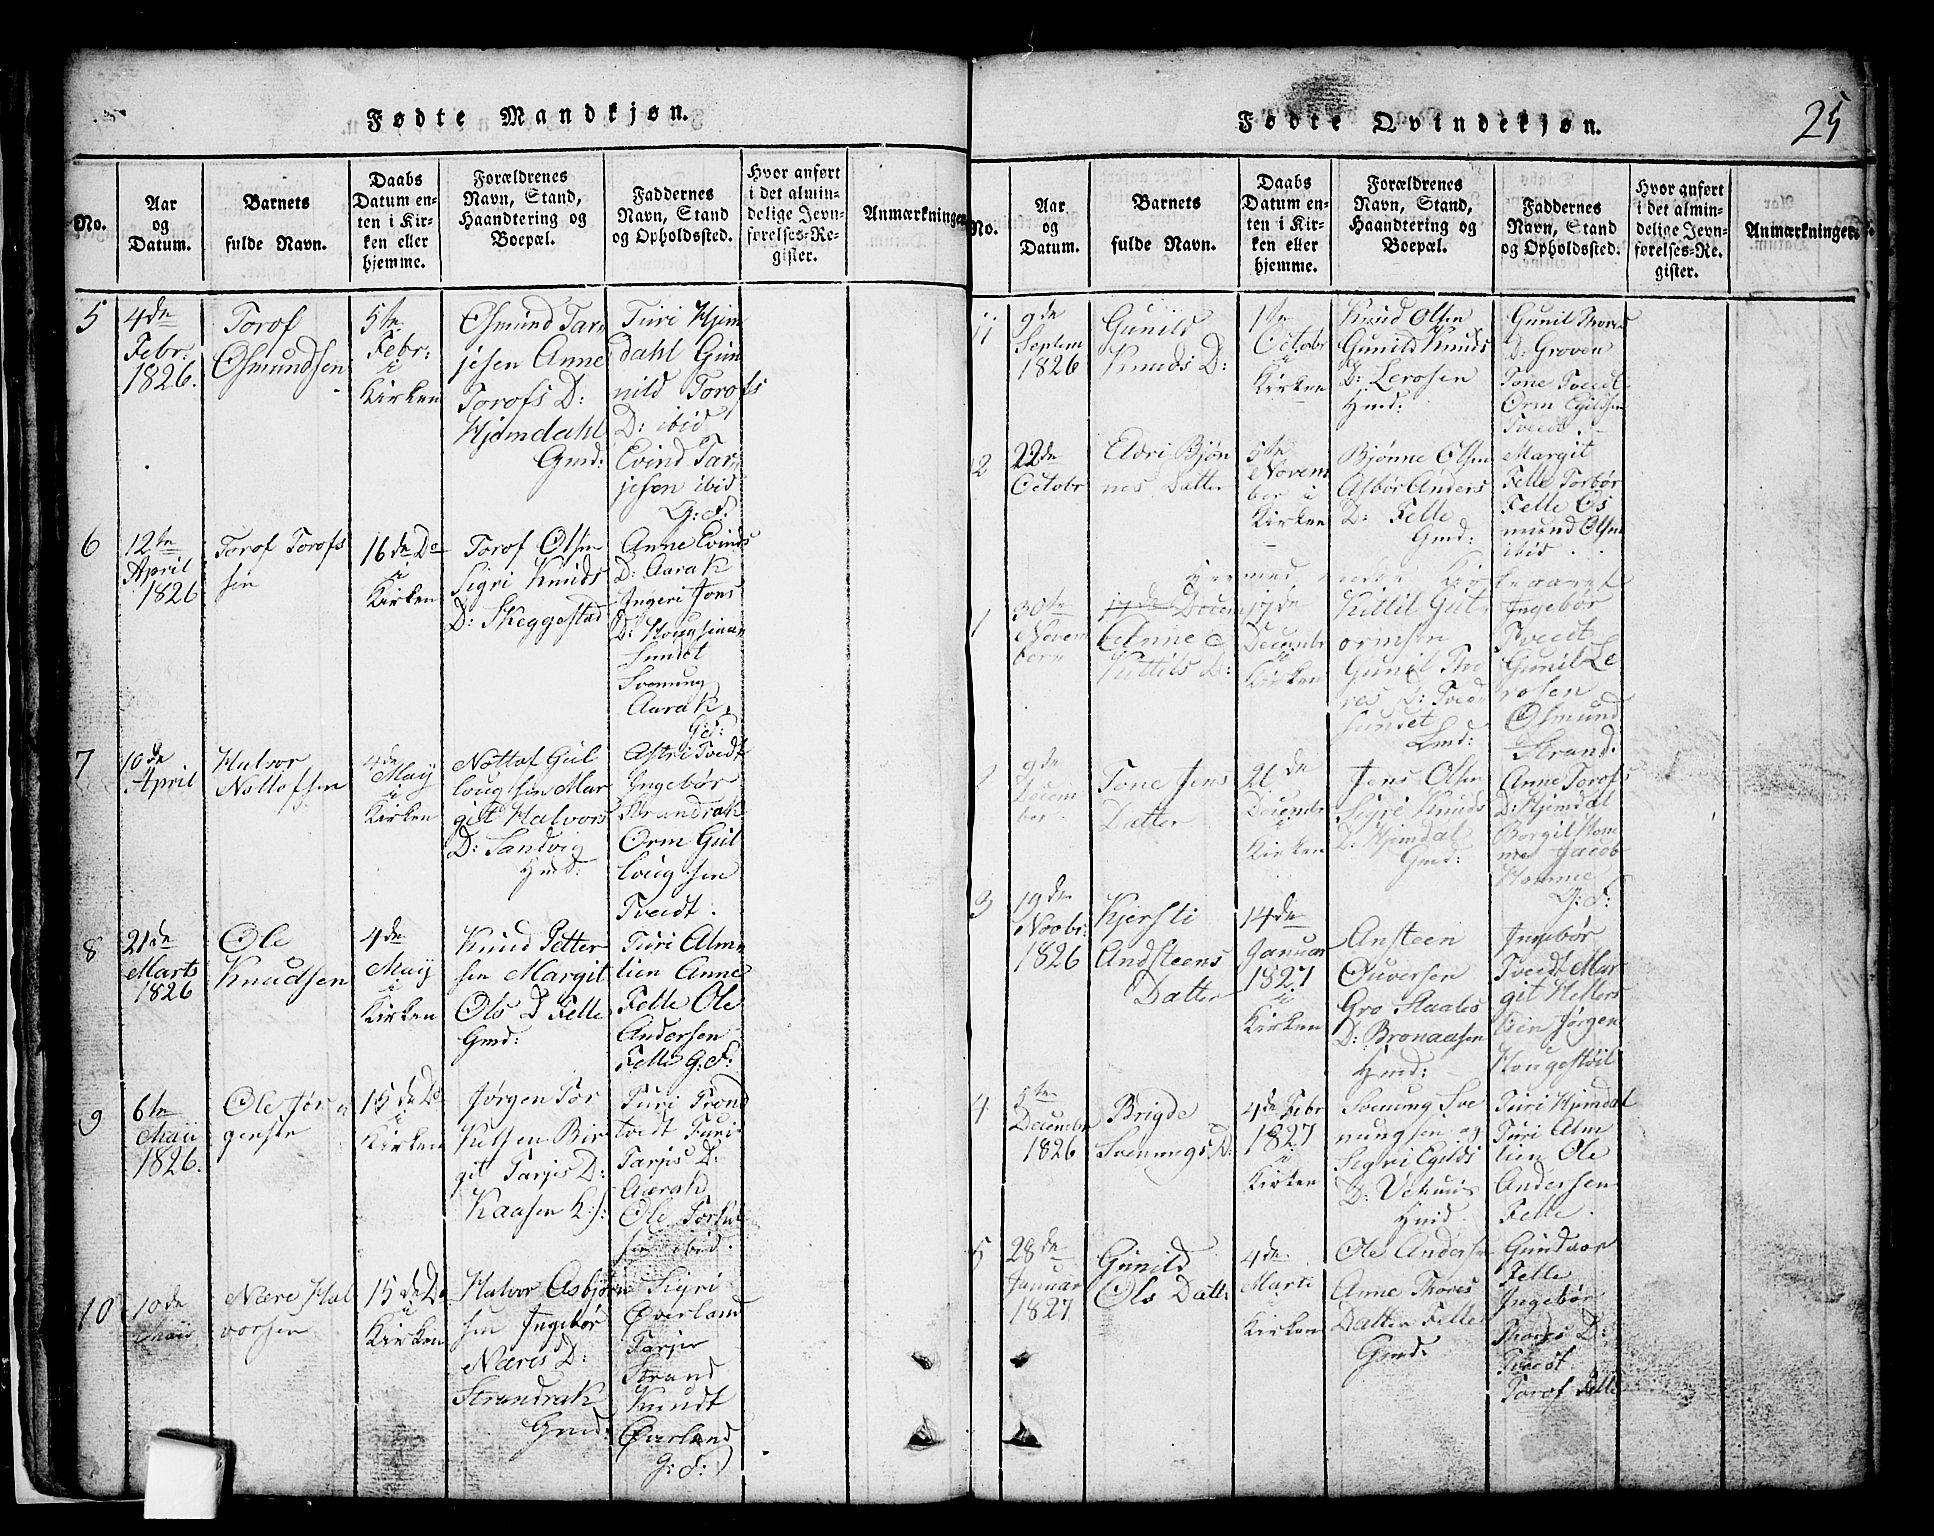 SAKO, Nissedal kirkebøker, G/Gb/L0001: Klokkerbok nr. II 1, 1814-1862, s. 25